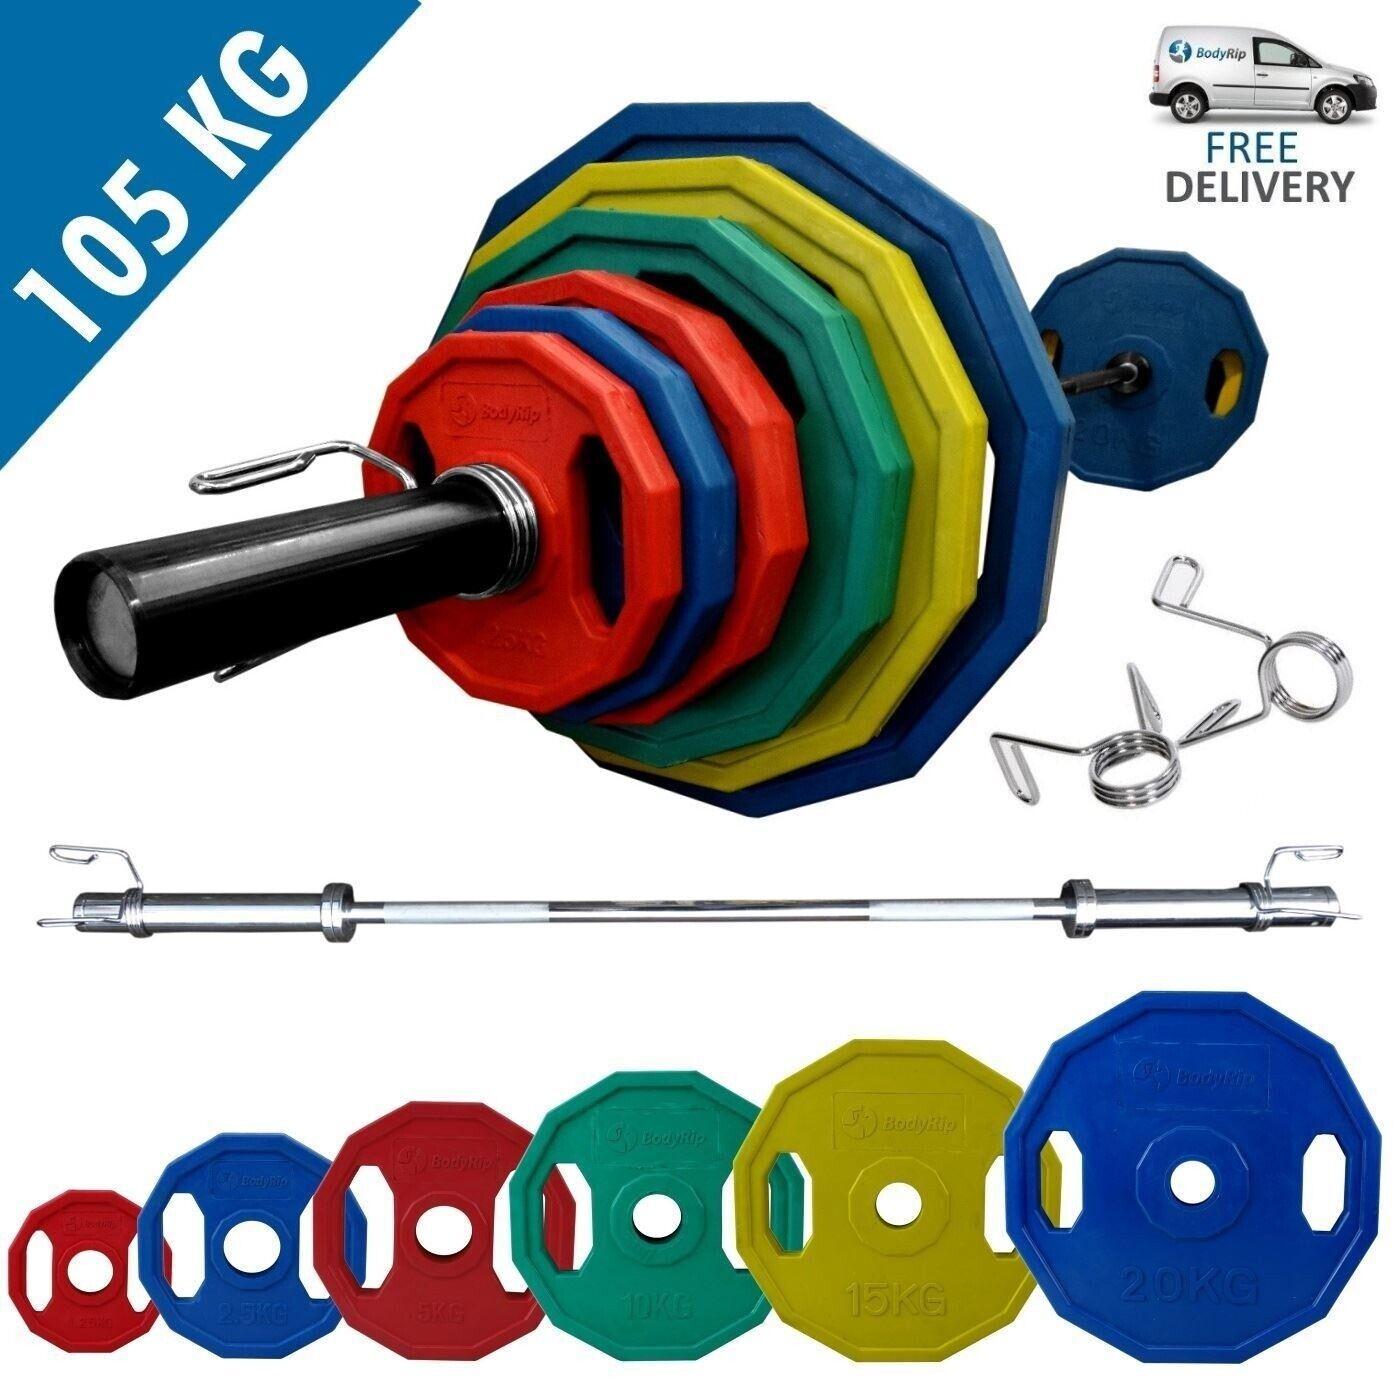 Bodyrip Poligonali Coloreeeeato Olimpico Peso Set di 105kg With 7ft Bilanciere